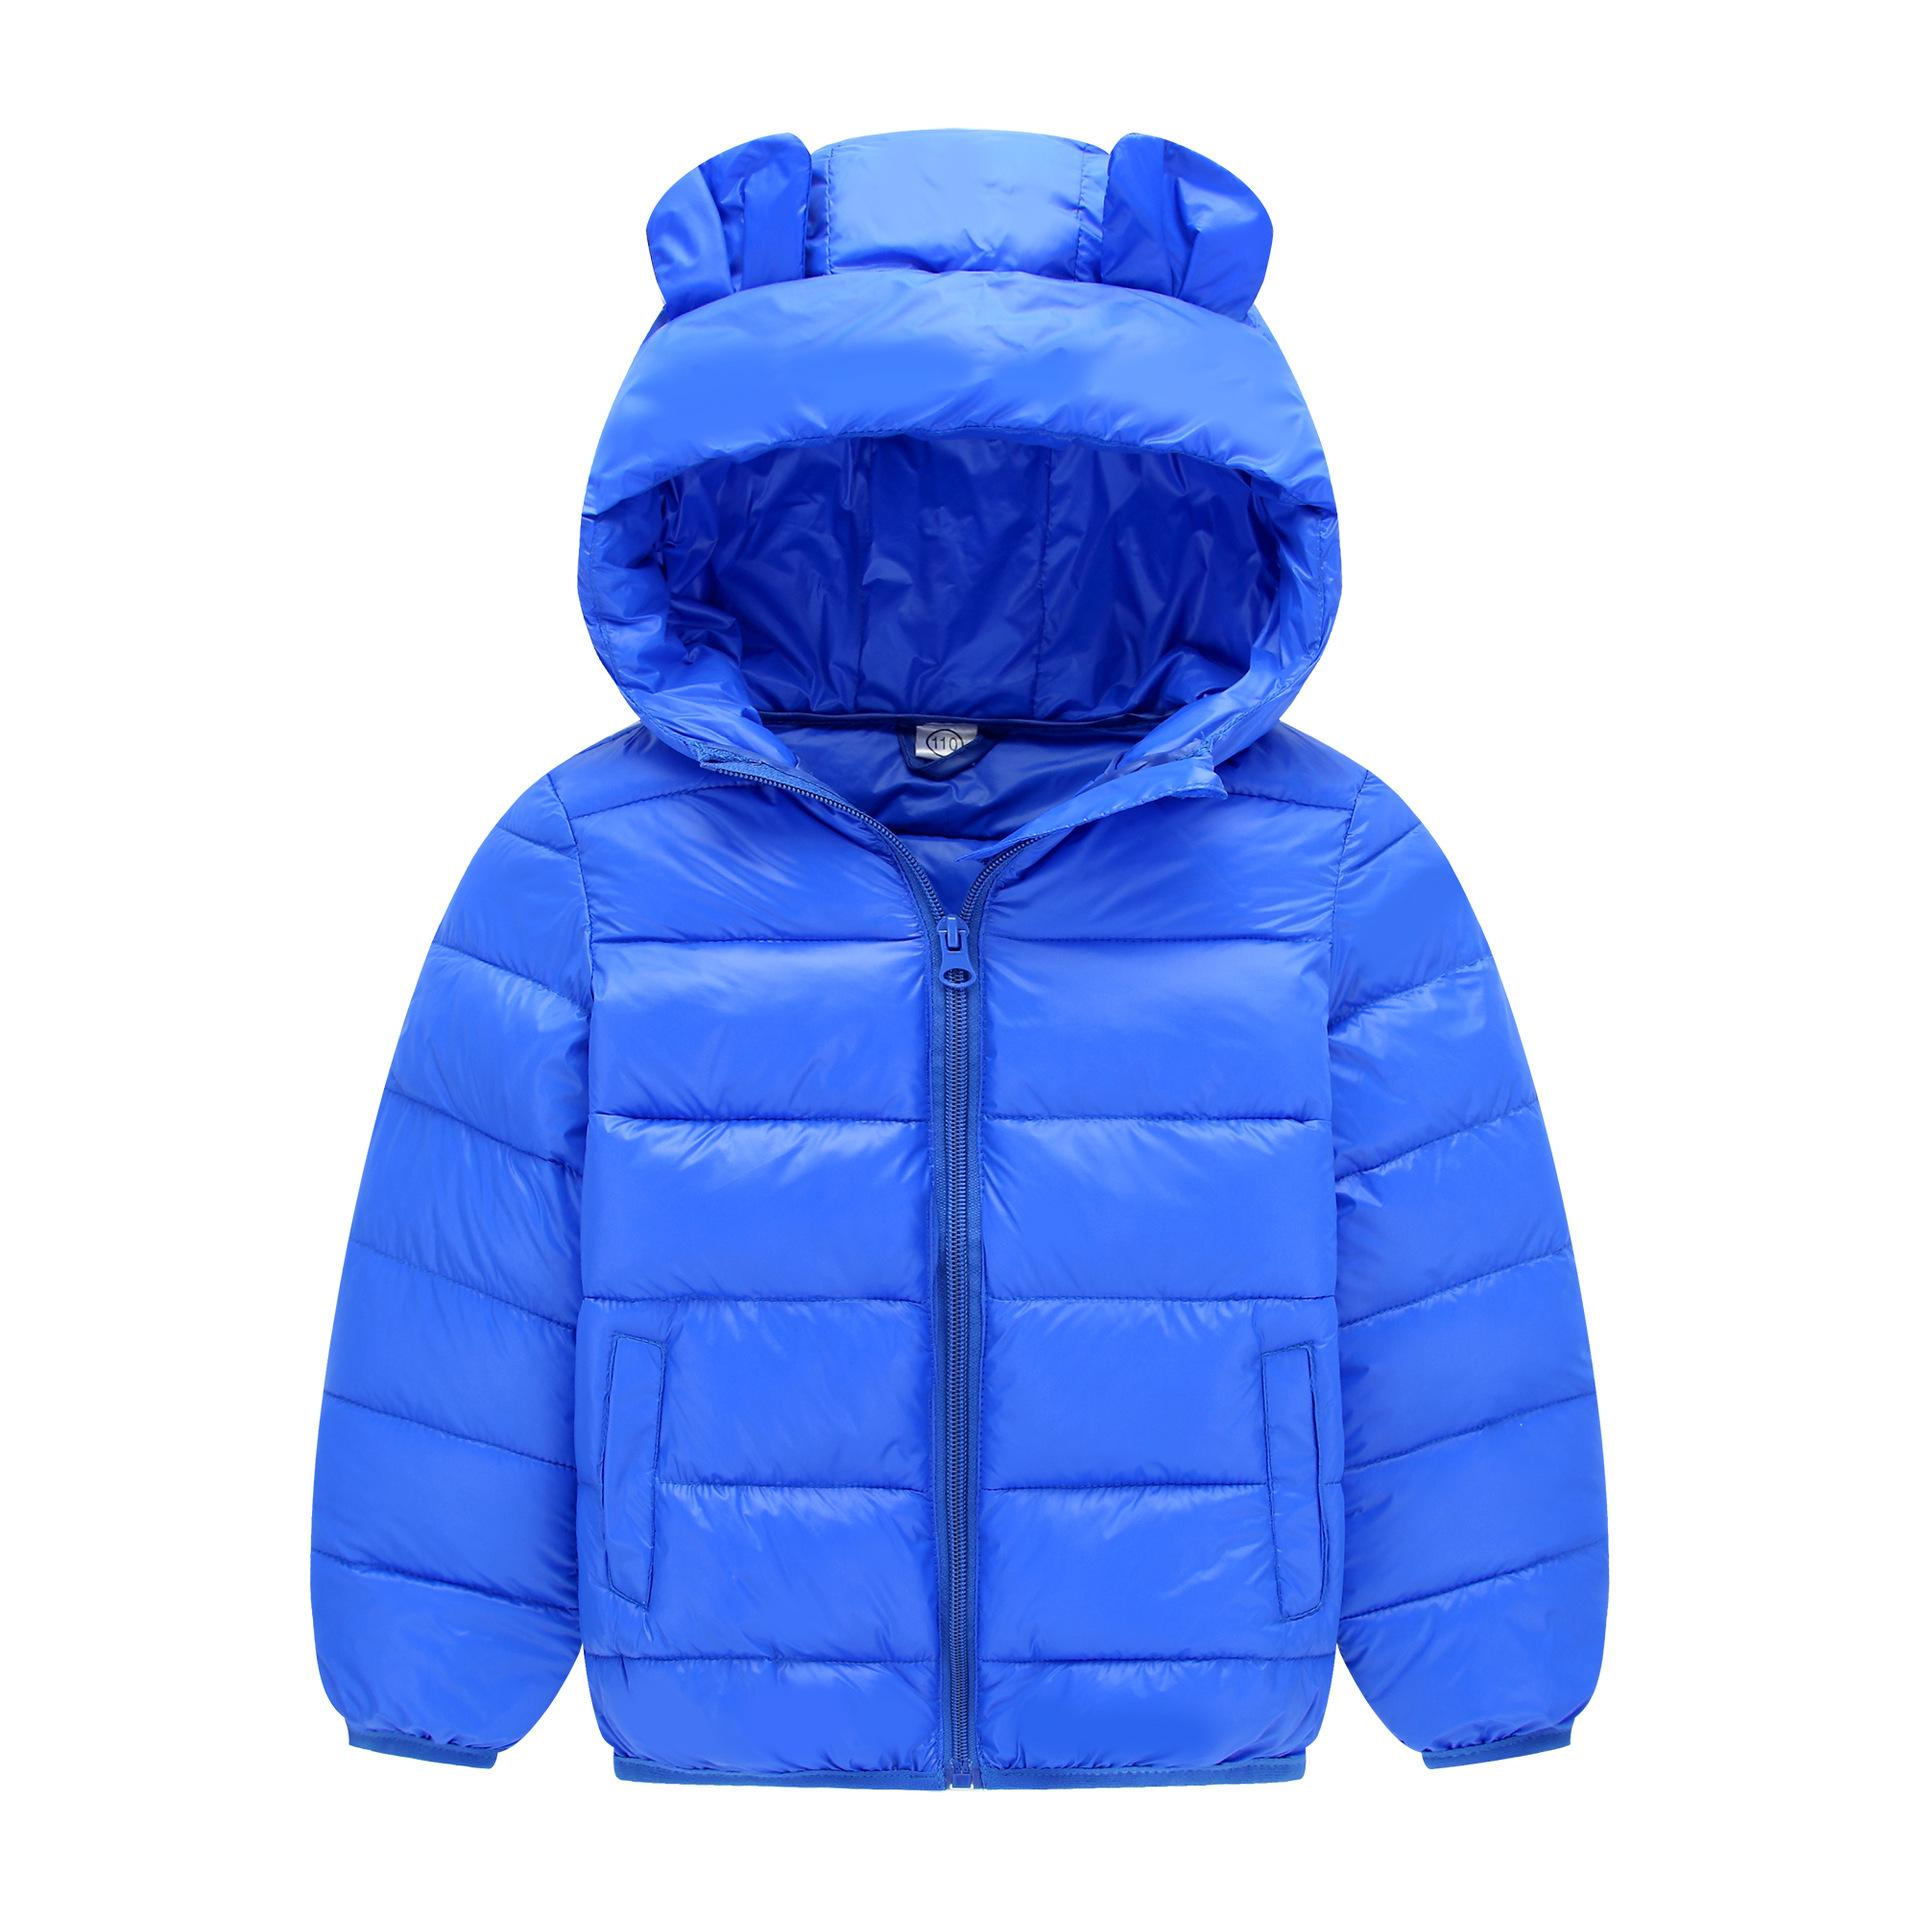 41cb58e7ff42 Aliexpress.com   Buy Baby Boys Jacket 2017 Autumn Winter Jackets For ...